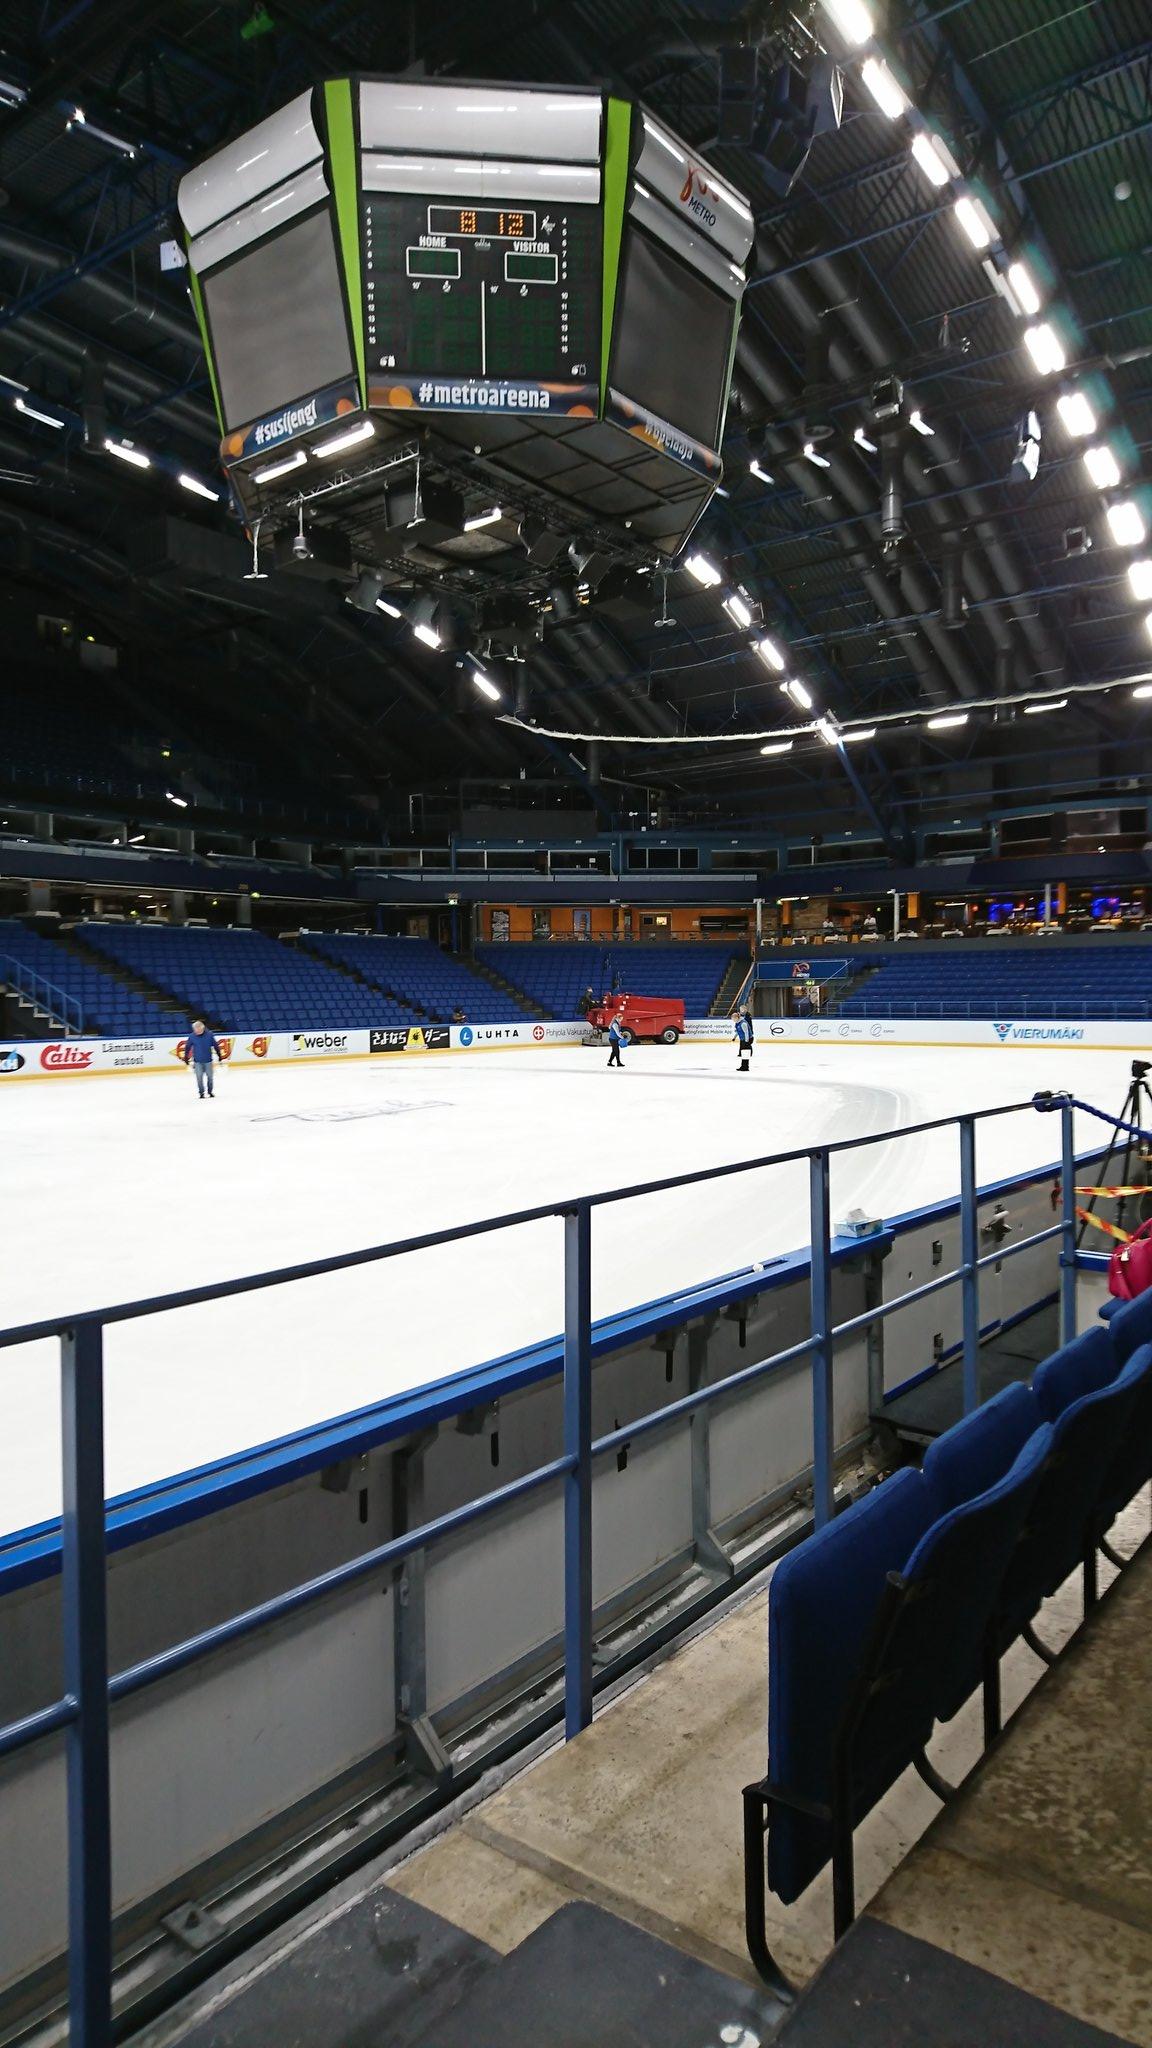 Challenger (6) - Finlandia Trophy. Oct 11 - 13, 2019. Espoo /FIN      - Страница 2 EGksfy6XUAAznk9?format=jpg&name=4096x4096